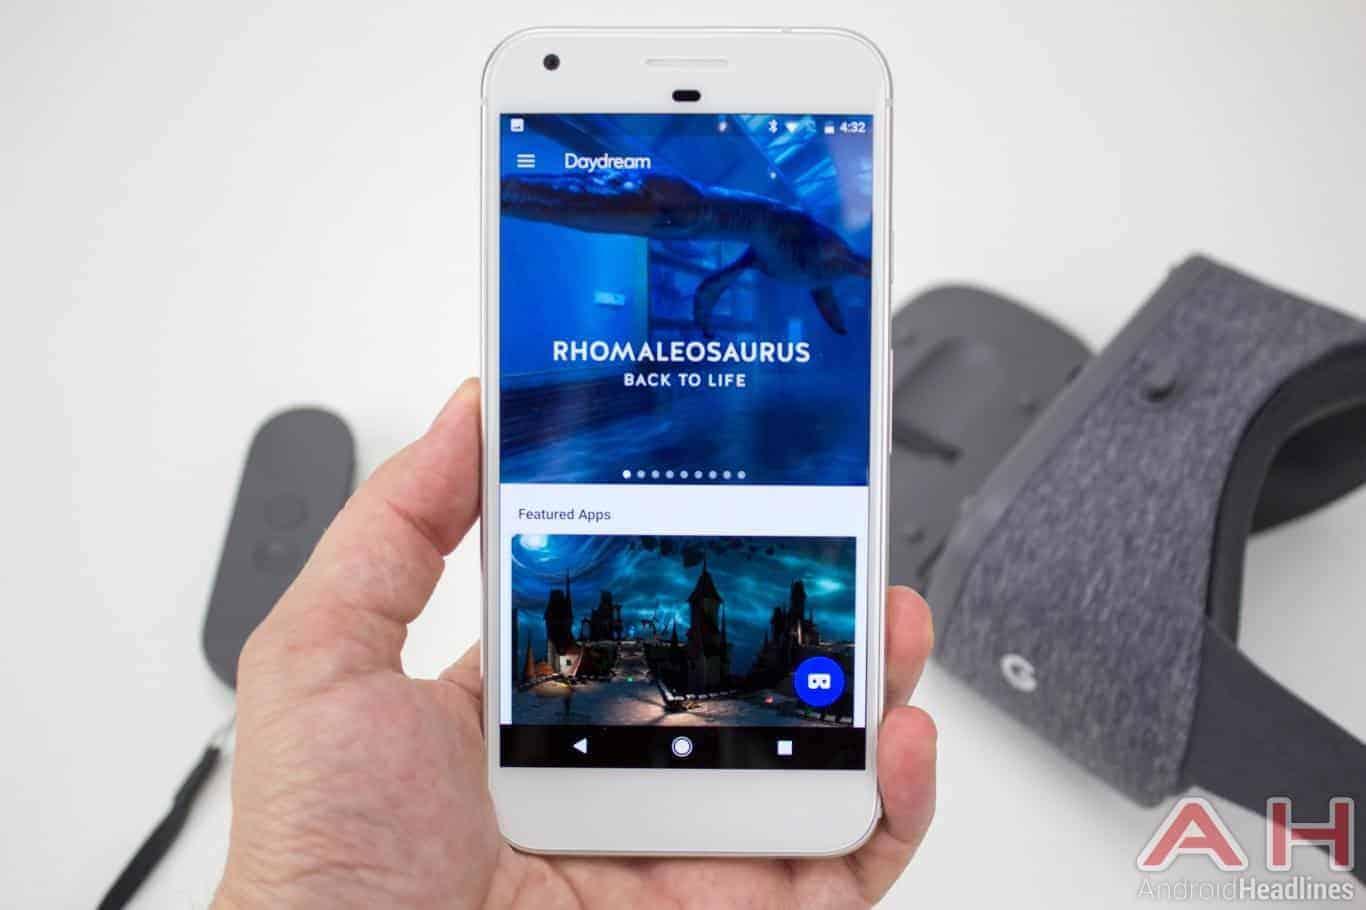 google-daydream-view-vr-ah-ns-app